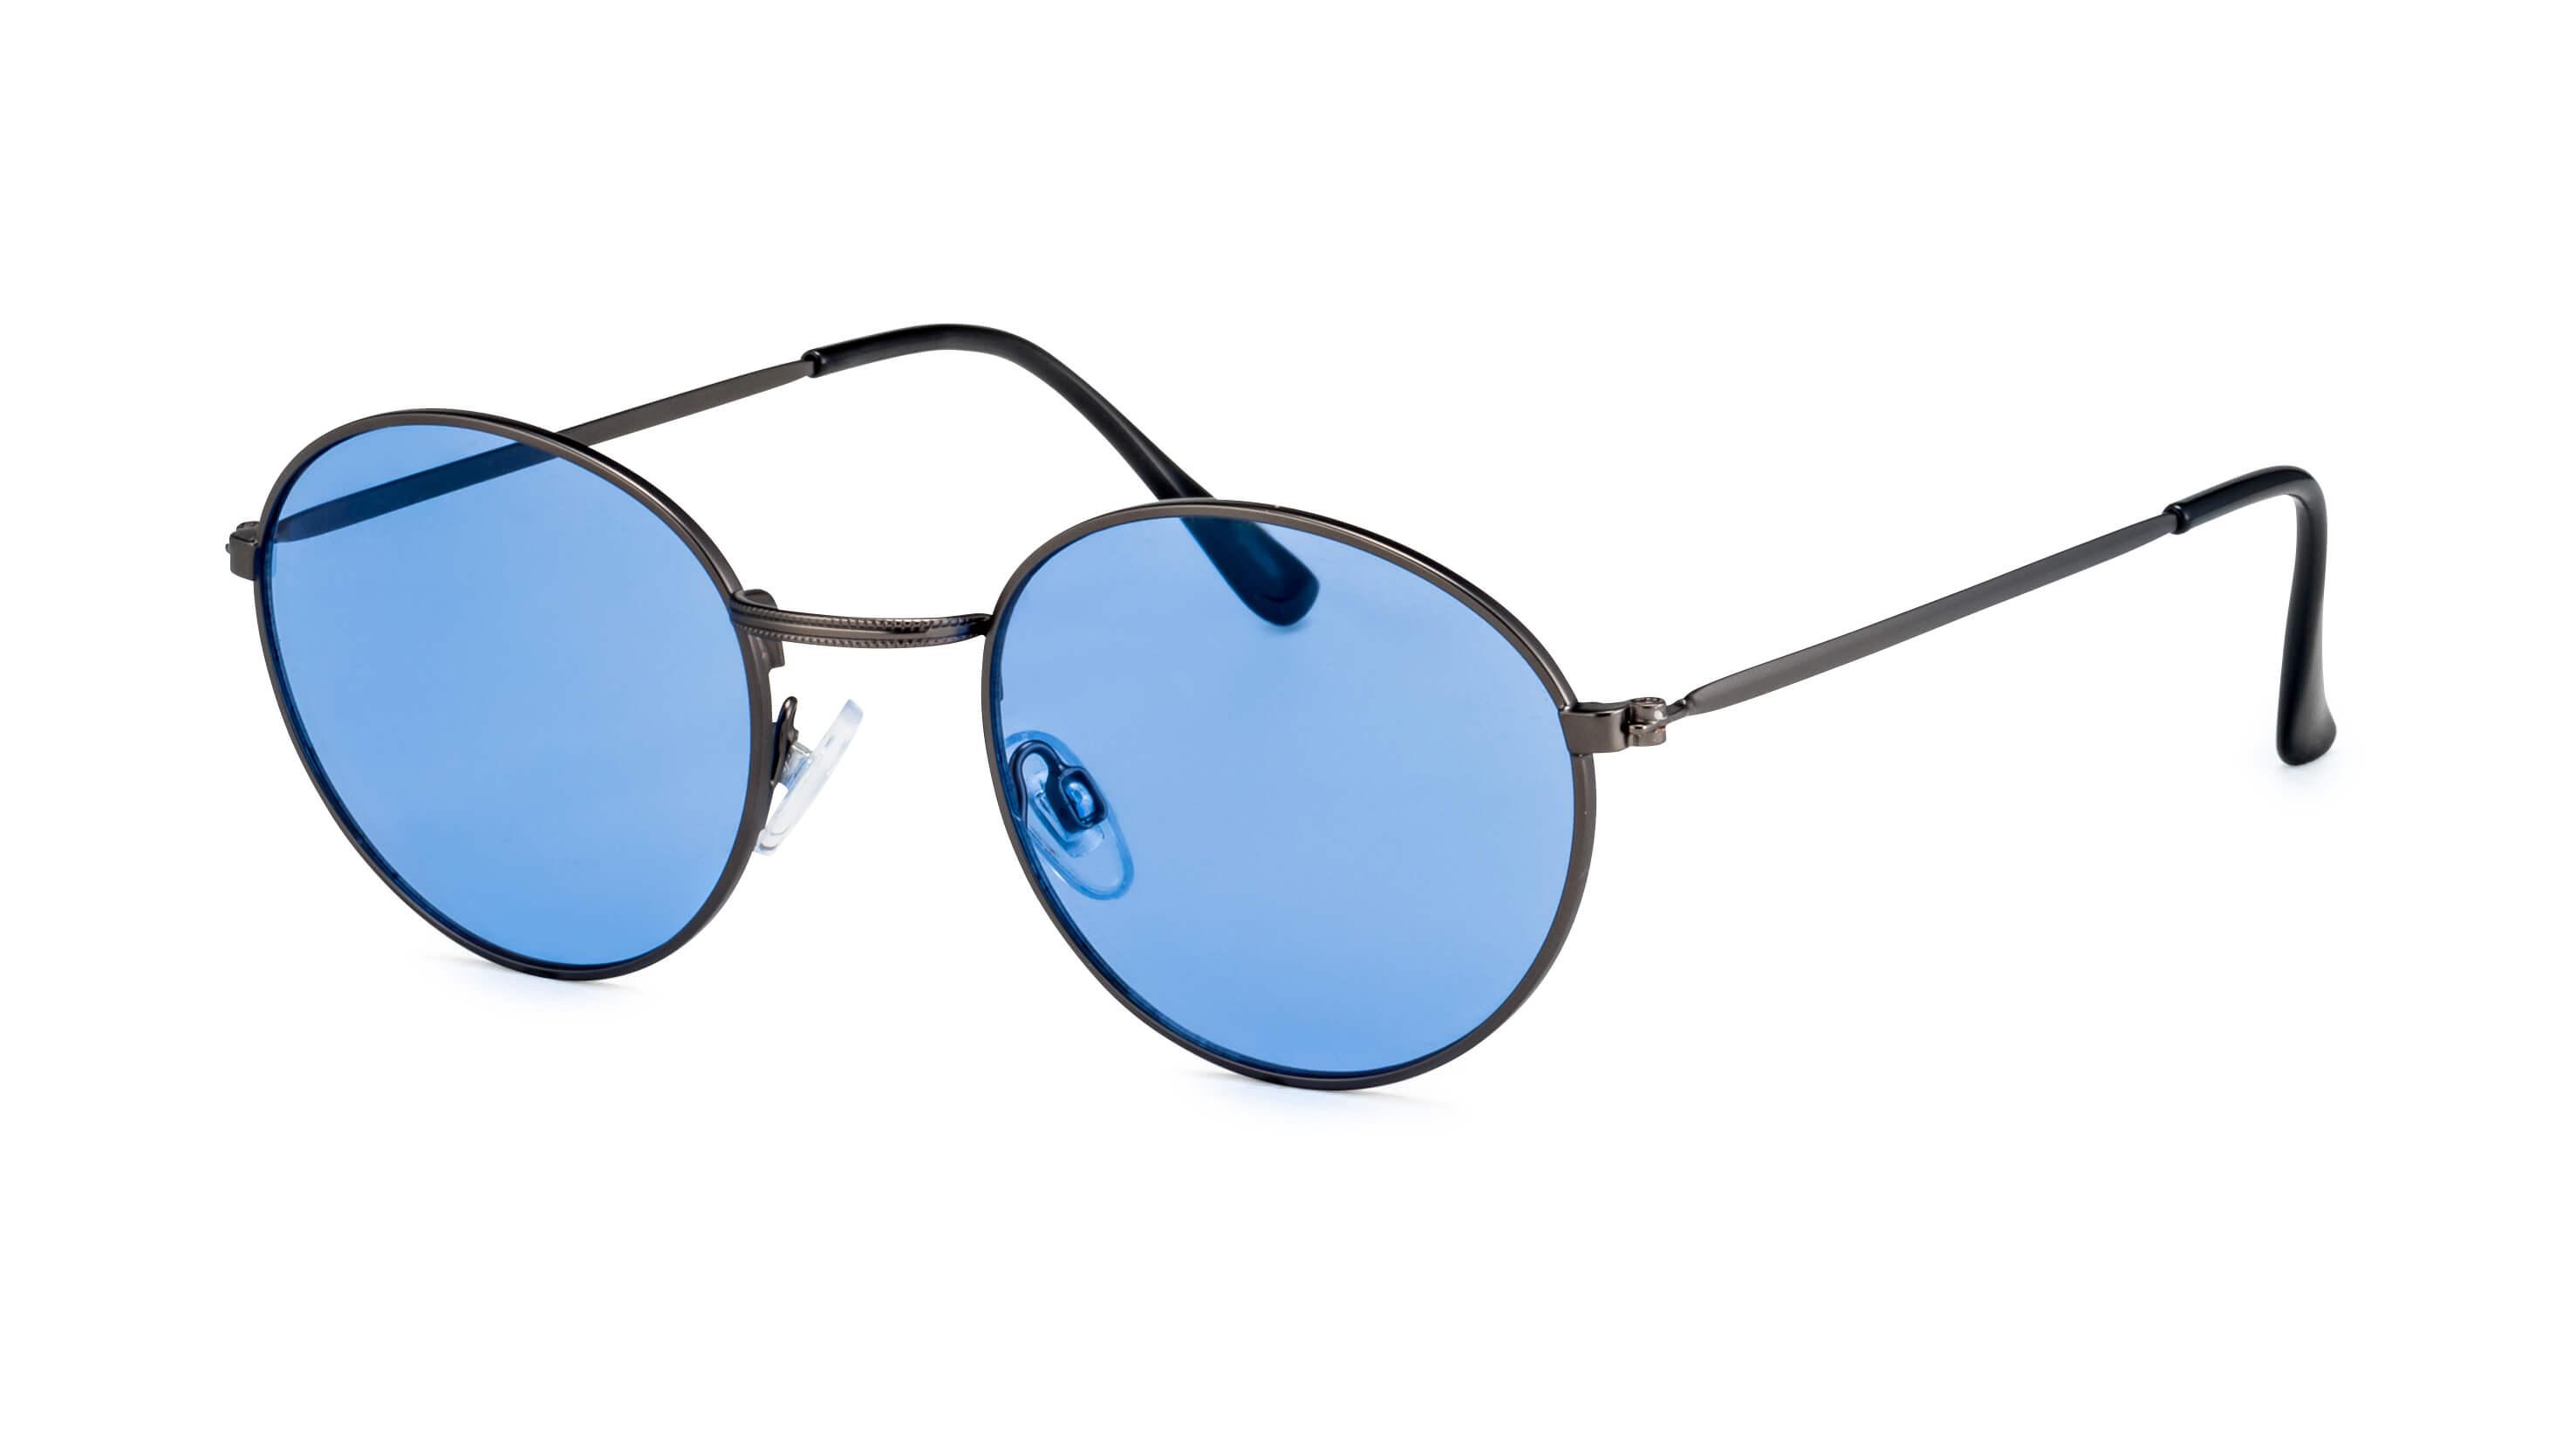 Main view sunglasses F3010600